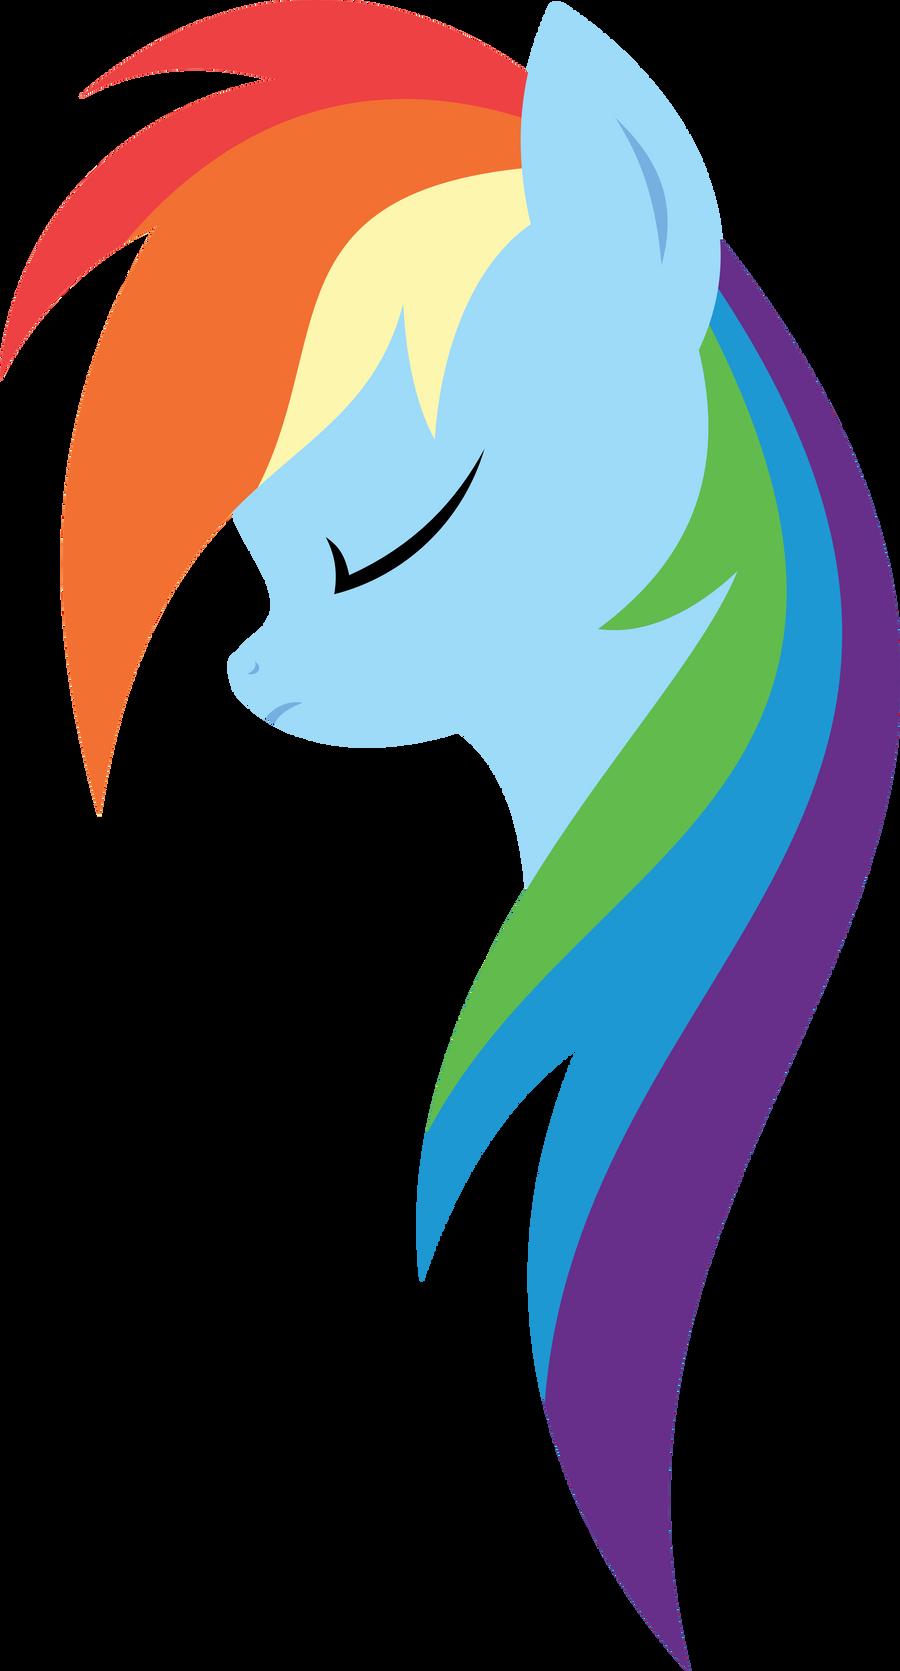 Minimal Rainbow Dash by xPesifeindx on deviantART